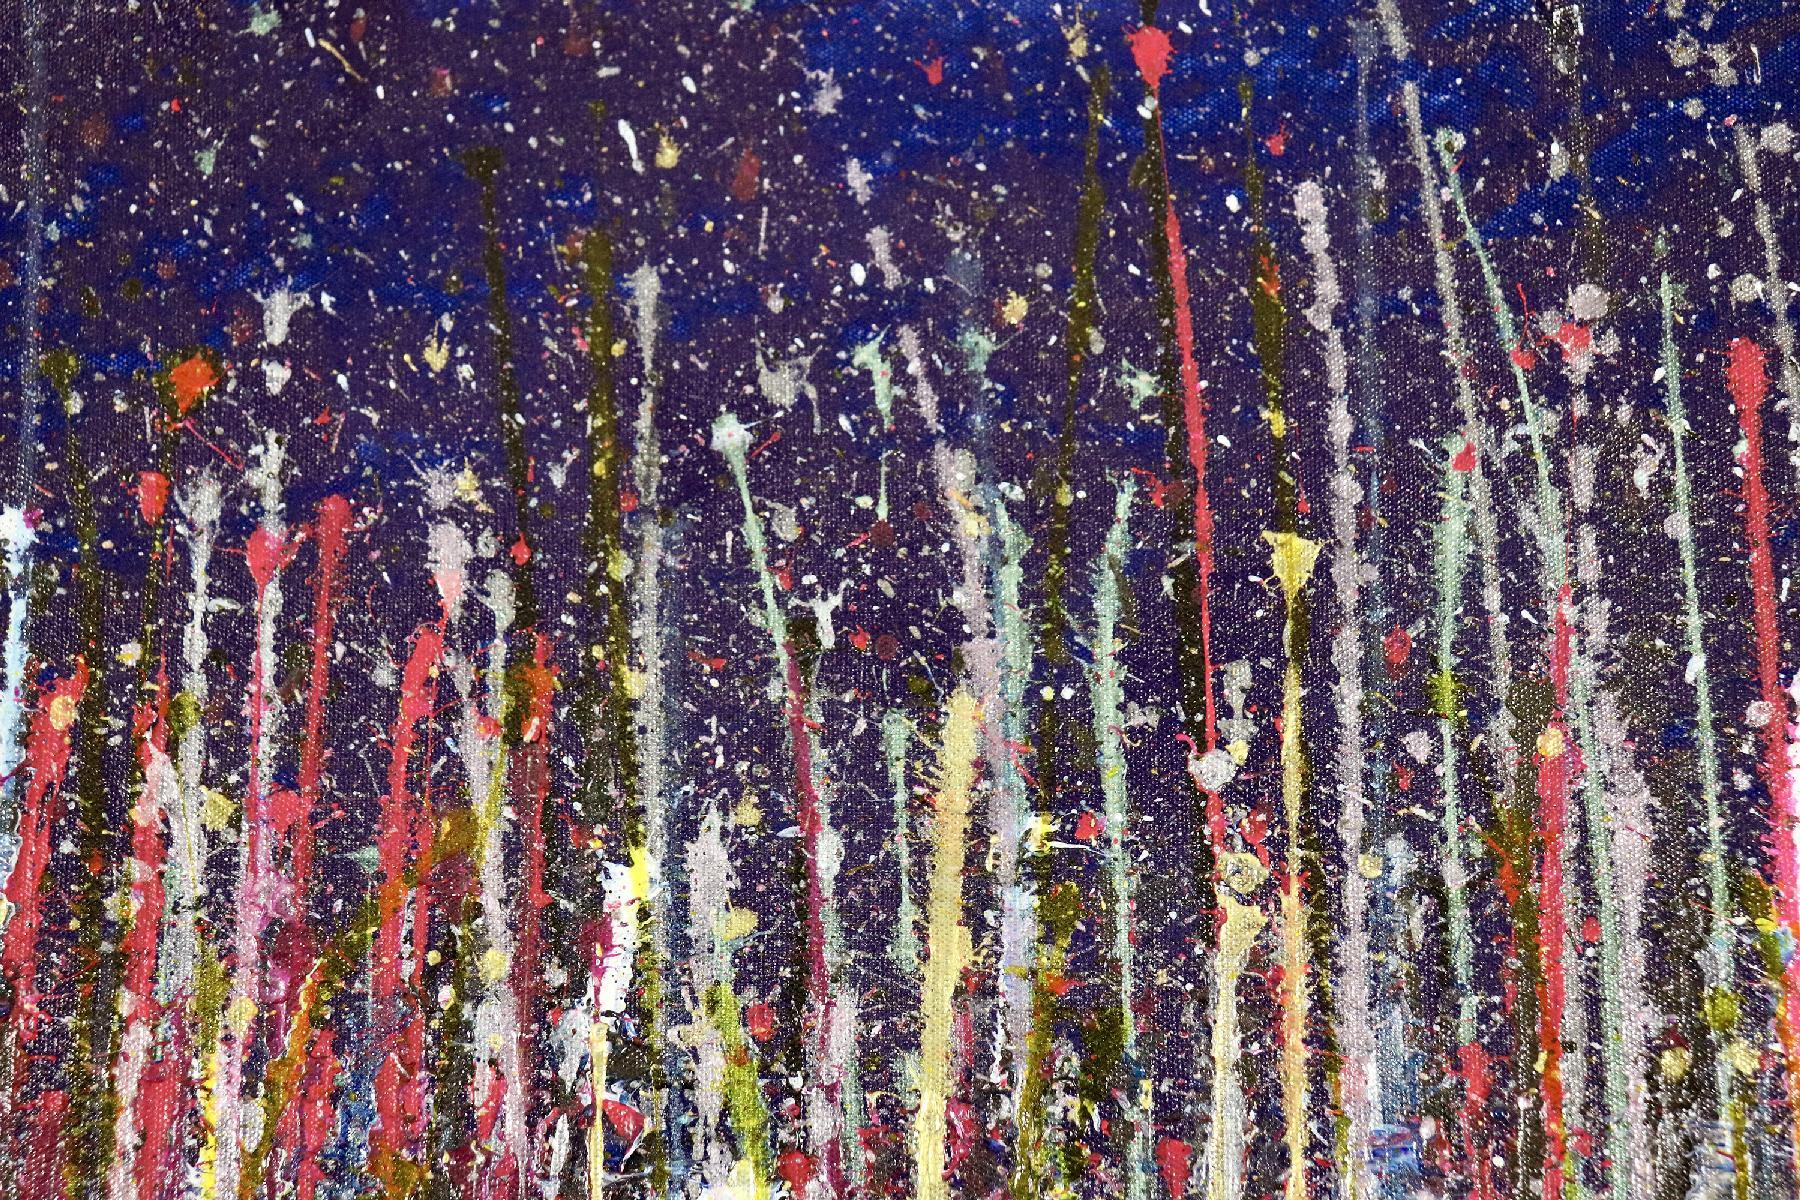 SOLD - Detail - A closer look (Luminance garden) 2 Painting by Nestor Toro